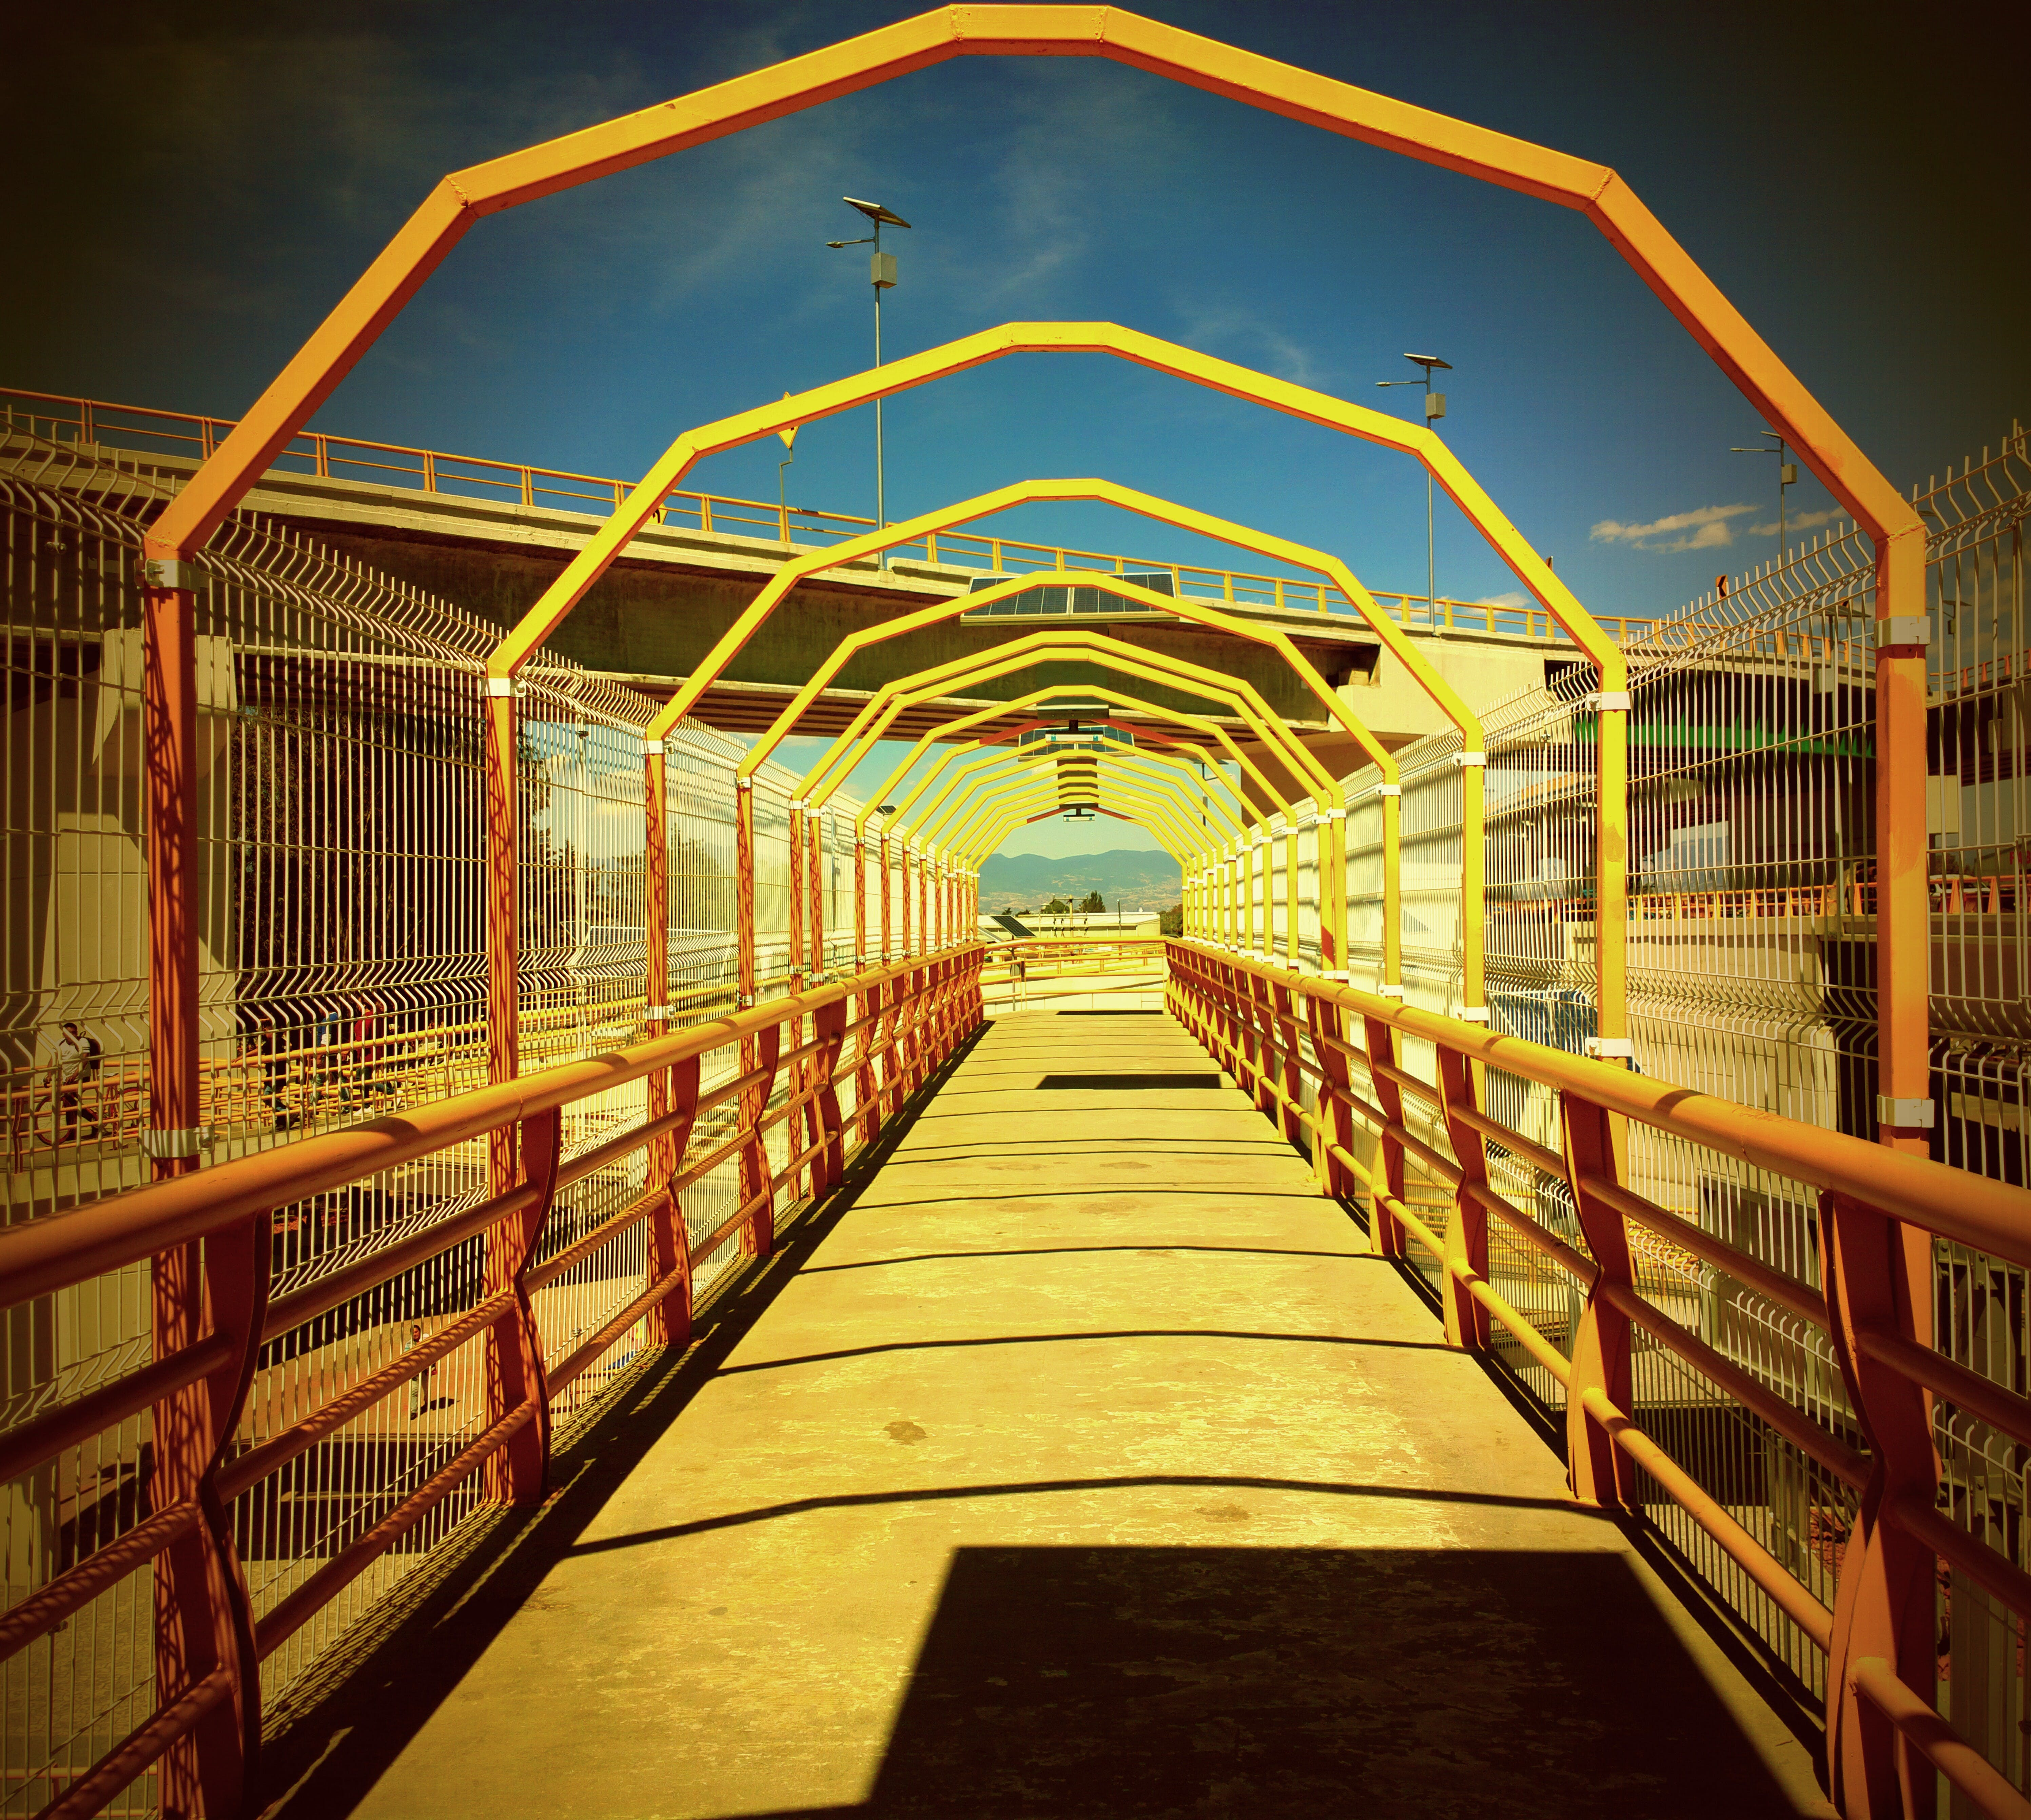 Free stock photo of bridge, ordinary, urban, urban place